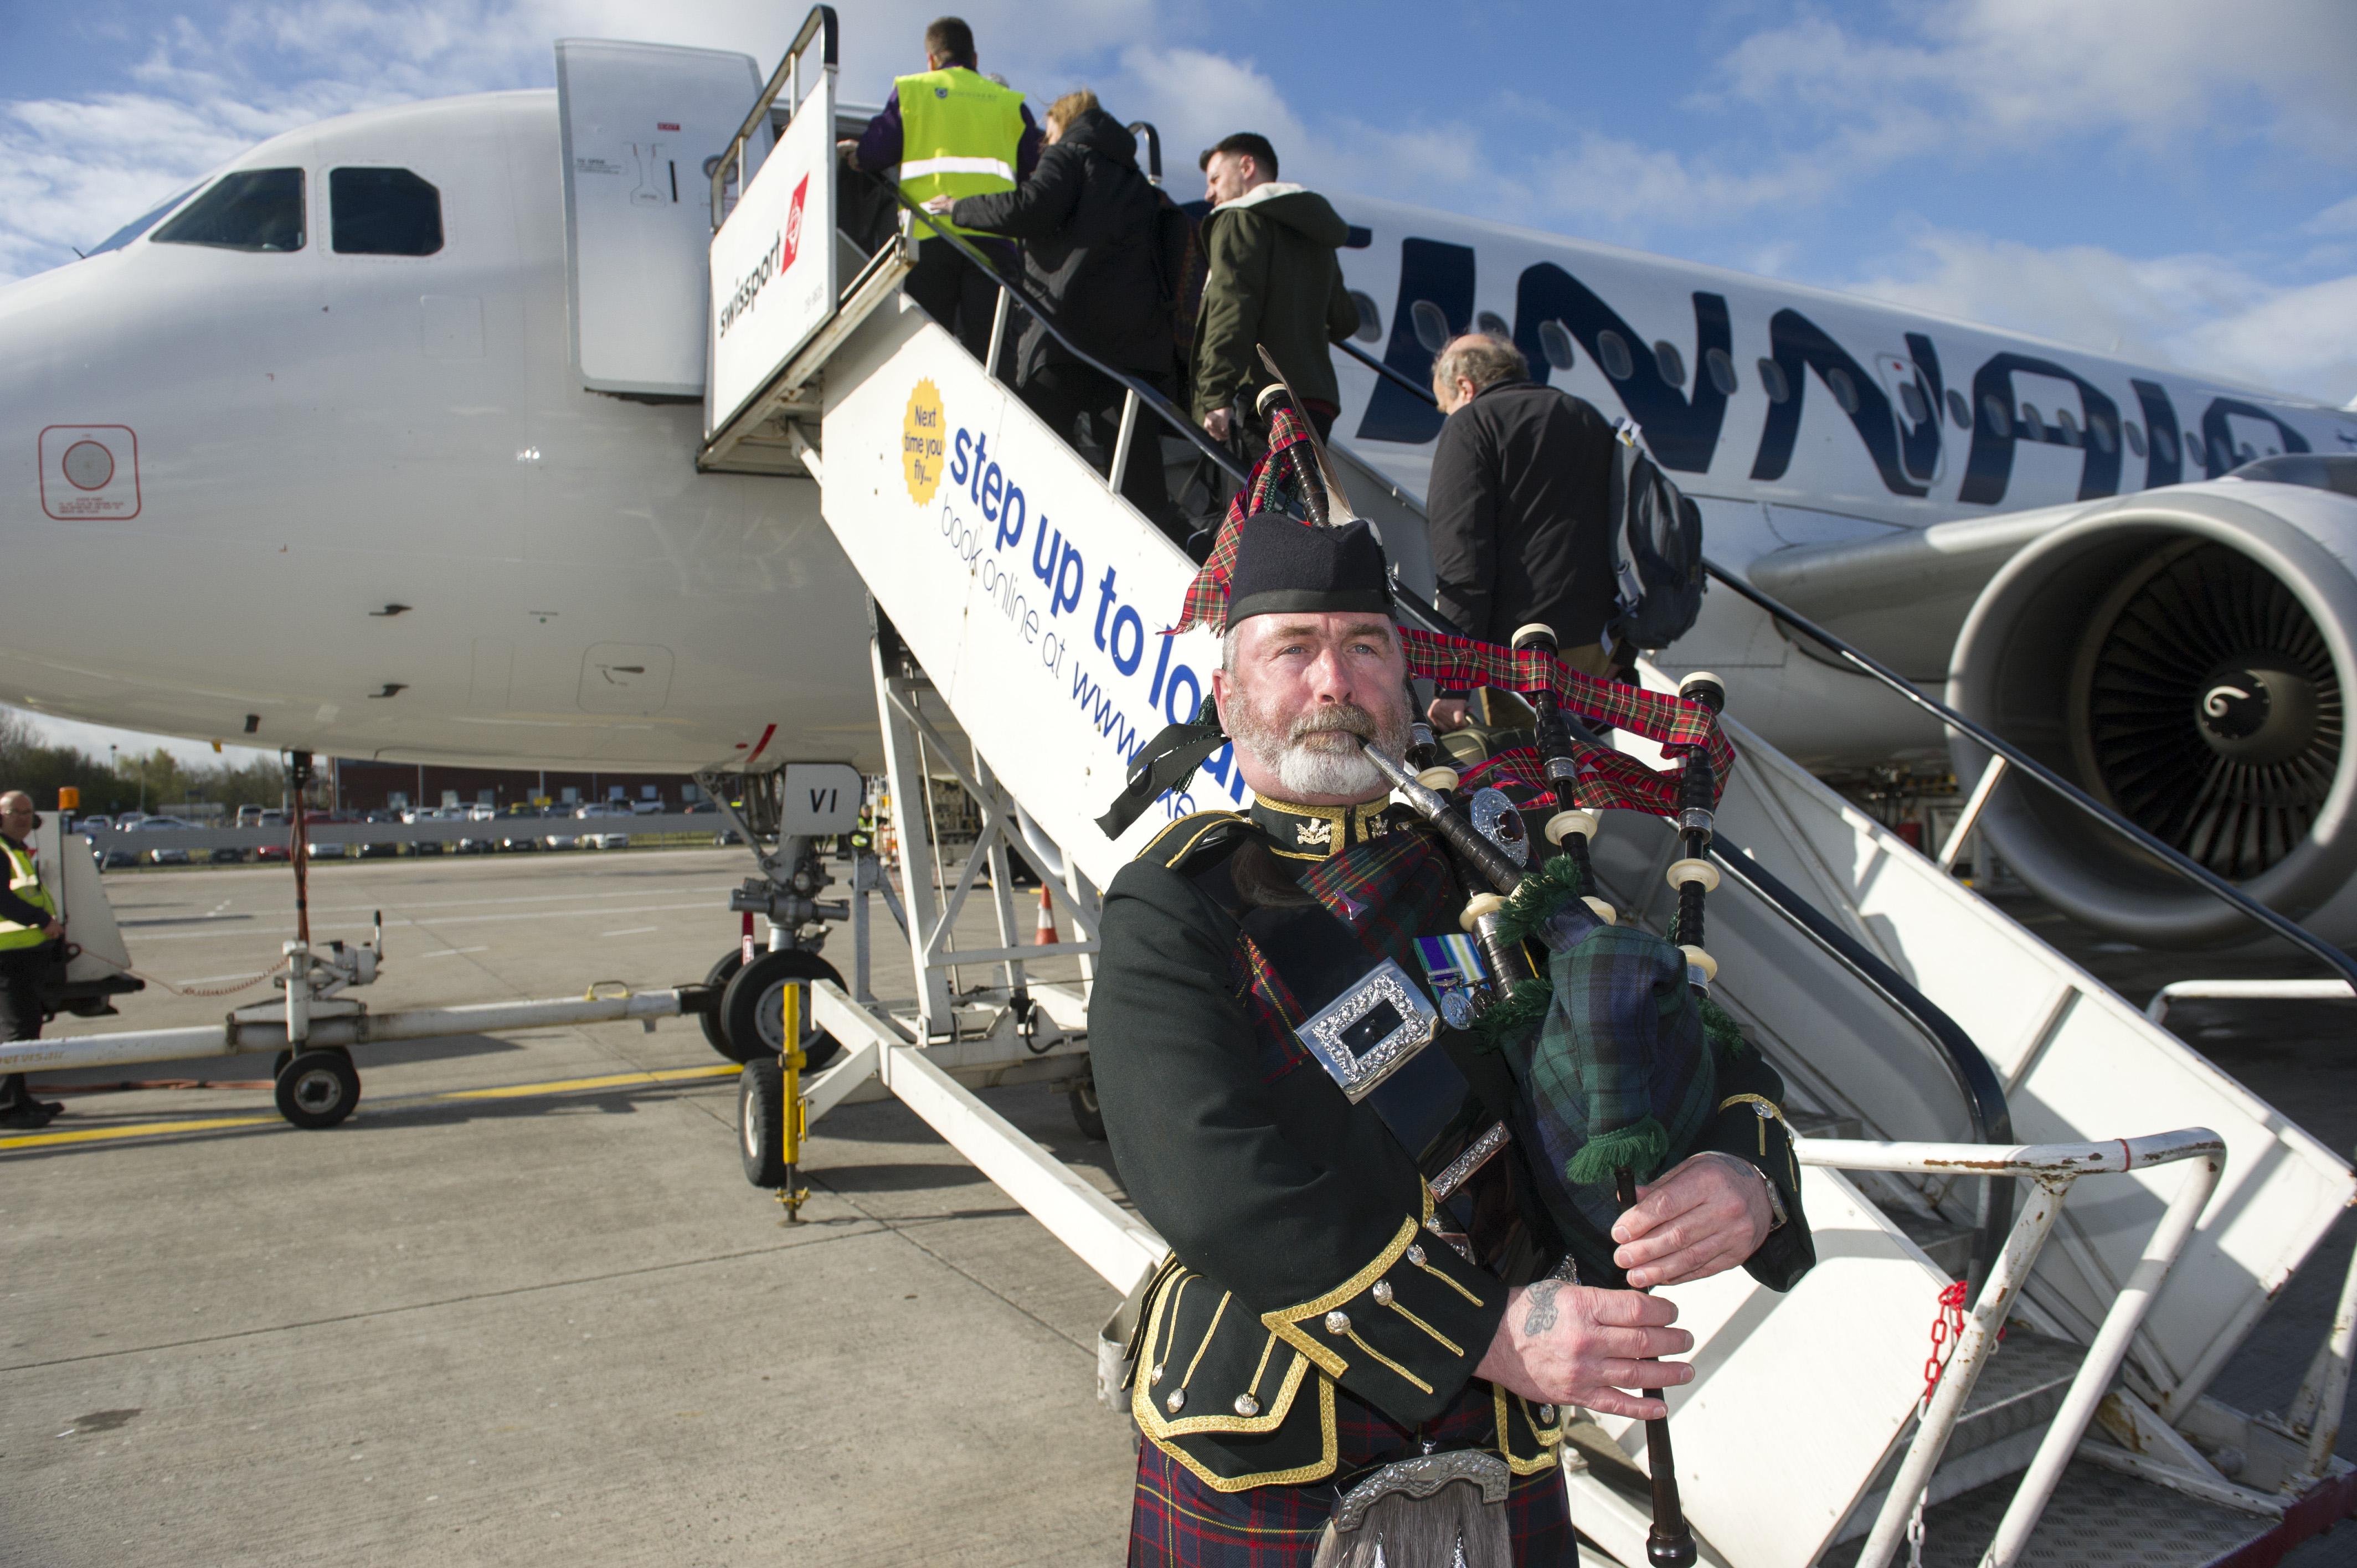 Finnair inaugural flight form Edinburgh Airport to Helsinki. Pictured is Edinburgh Airport Chief Executive Gordon Dewar, Fredrik Charpentier and Finnair Captain Antti Rautianen. © Lesley Martin 2016